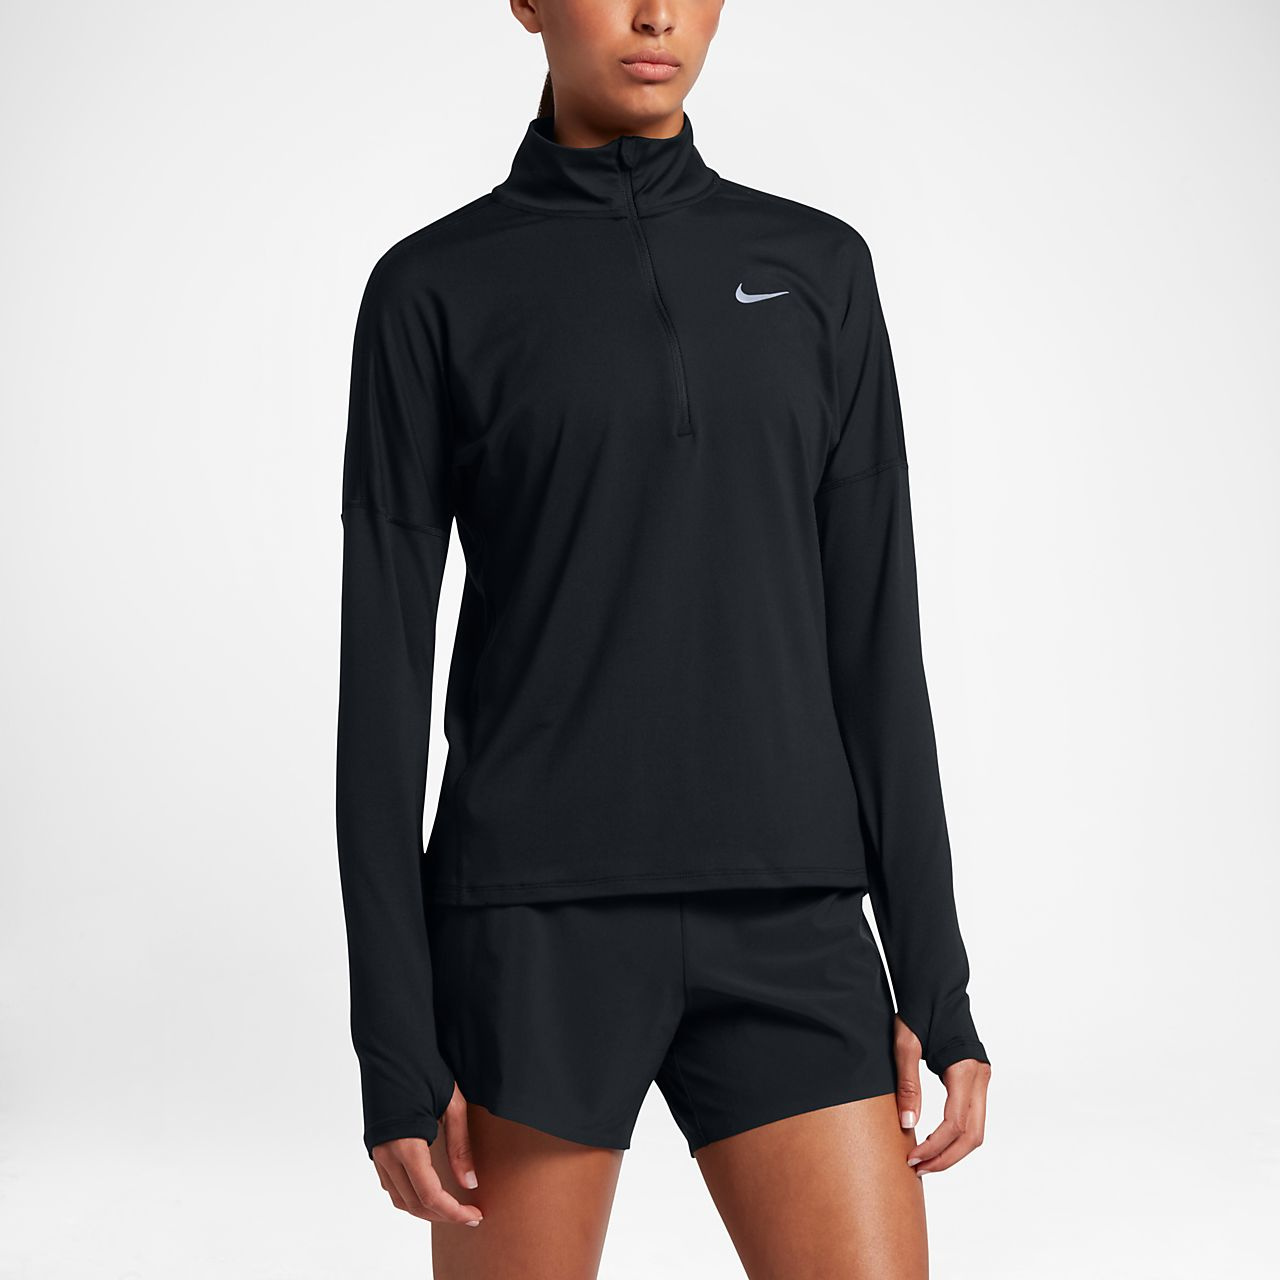 0765ac50281ff Nike Dri-FIT Element Women s Long-Sleeve Running Half-Zip Top. Nike ...